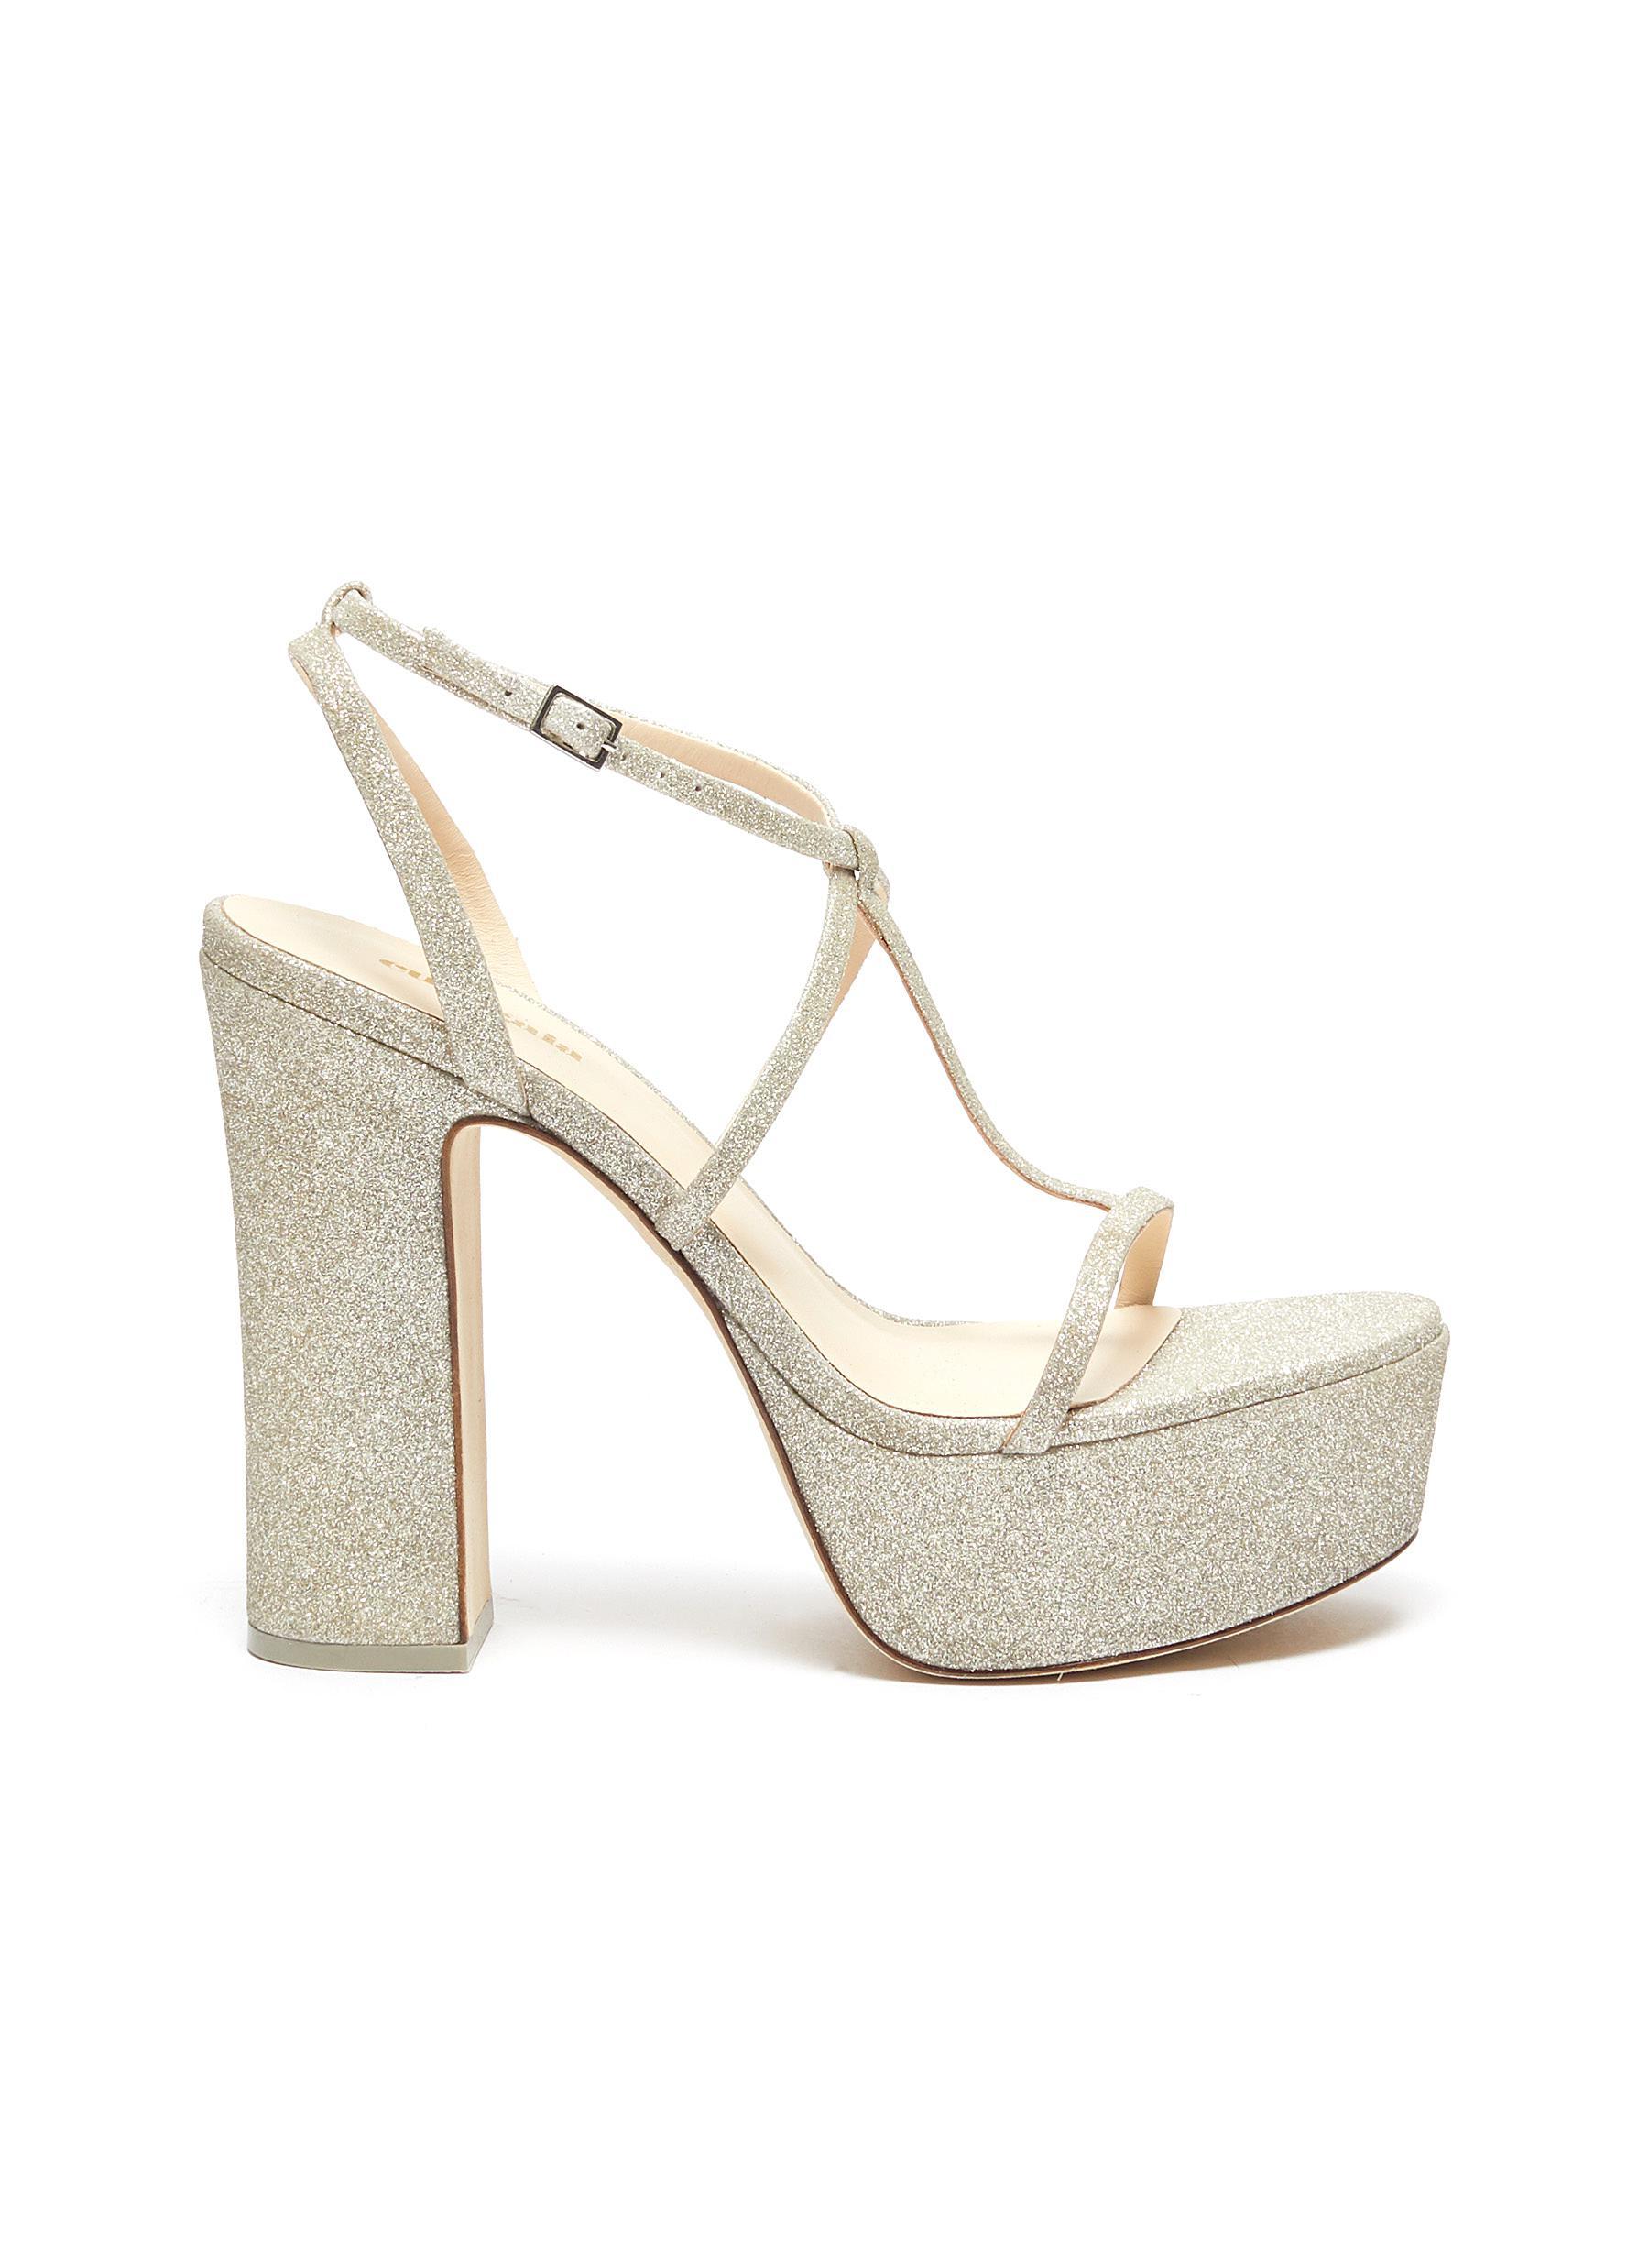 Angela glitter platform sandals by Cult Gaia